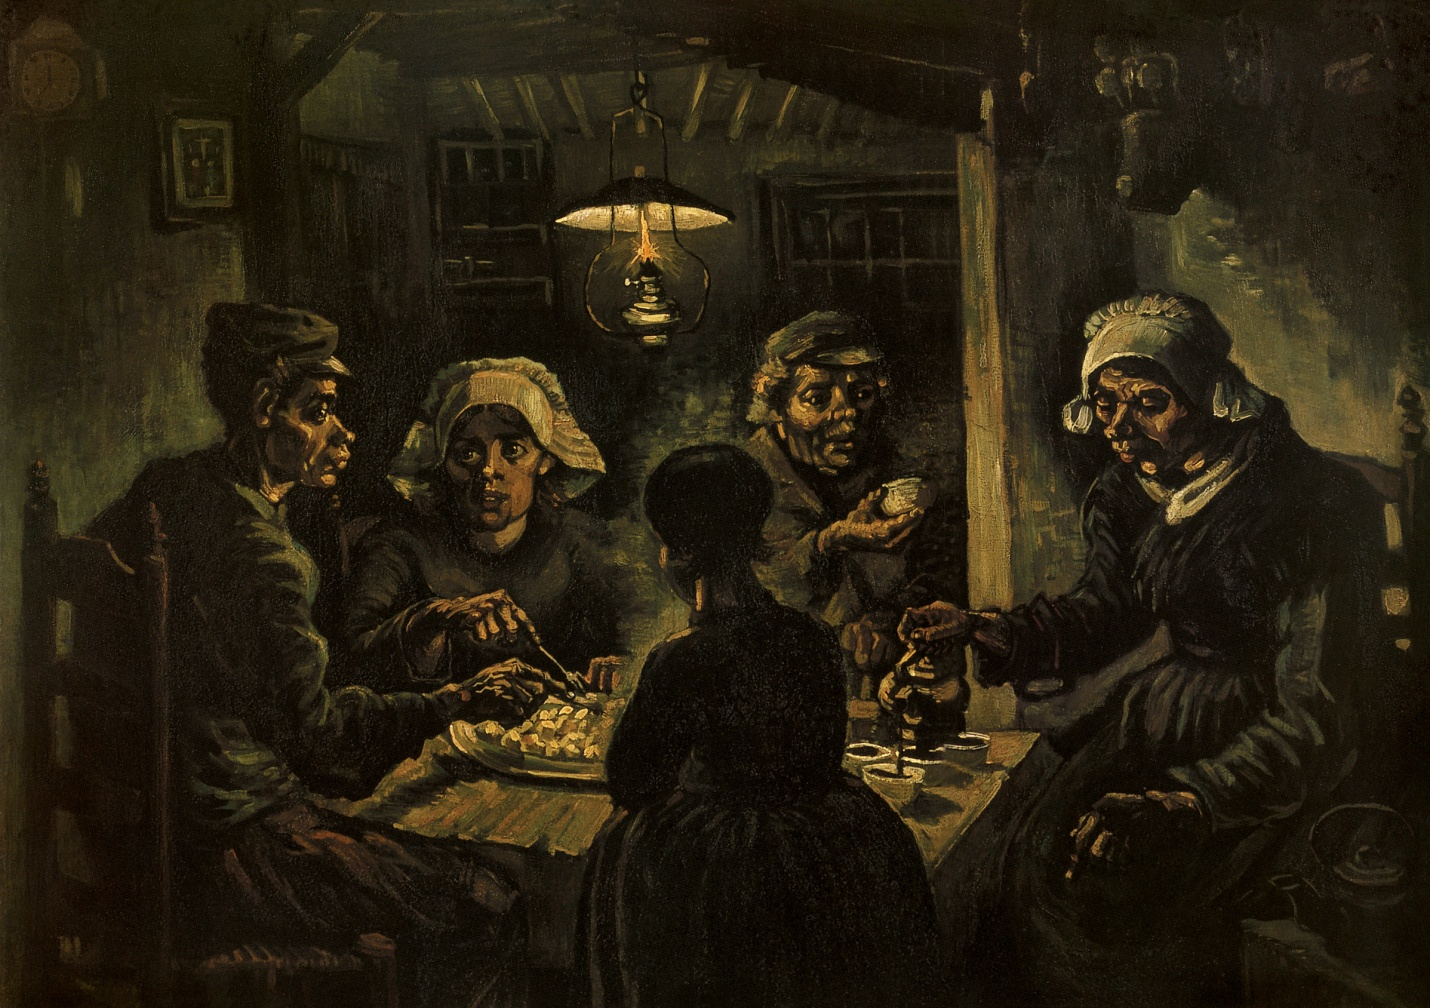 Vincent Van Gogh, The Potato Eaters, 1885. Oil on canvas, 82 x 114 cm. Van Gogh Museum, Amsterdam.